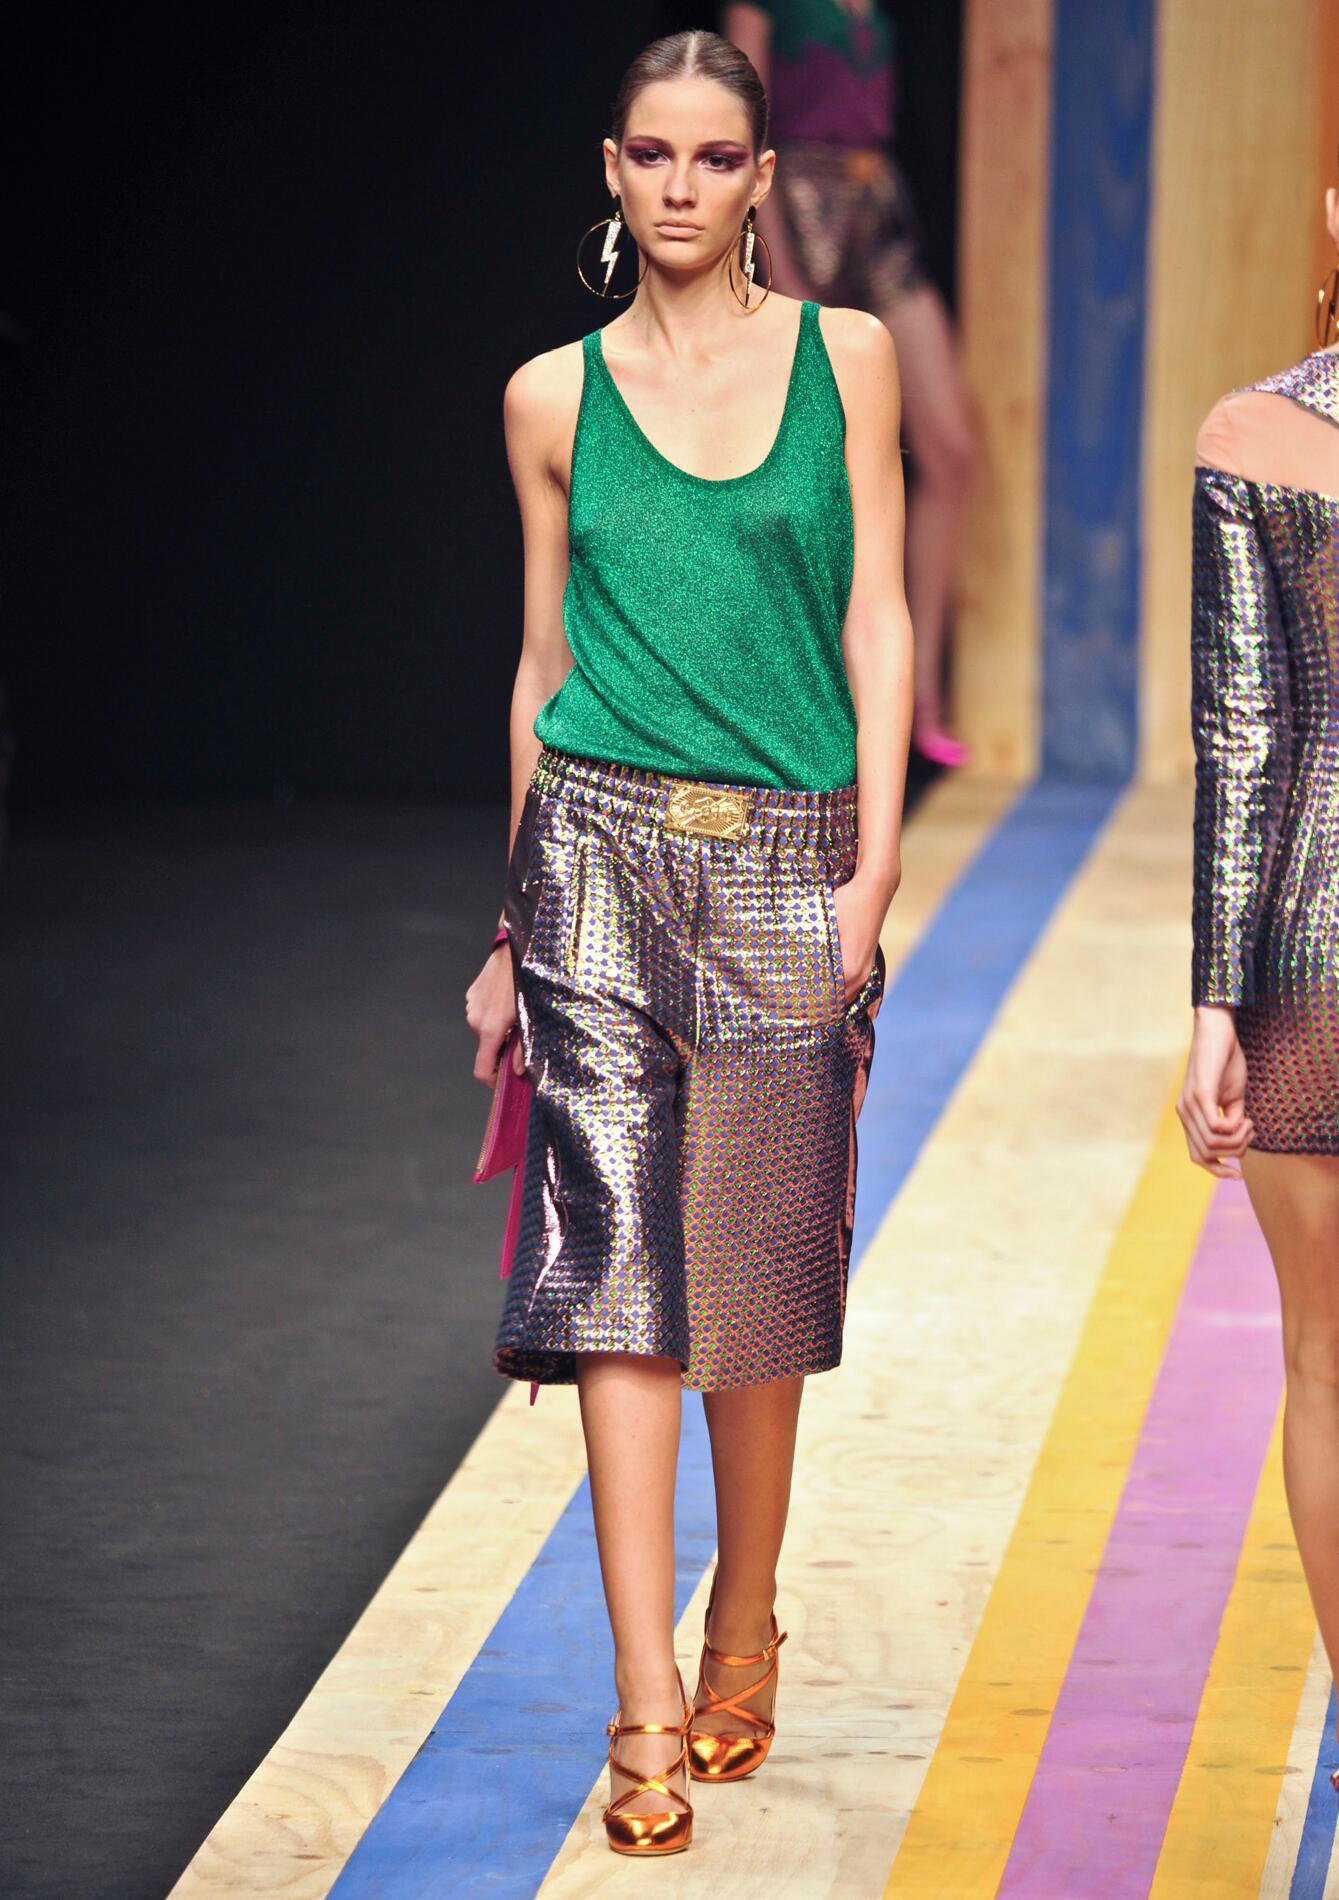 Women Summer Fashion Trends 2013